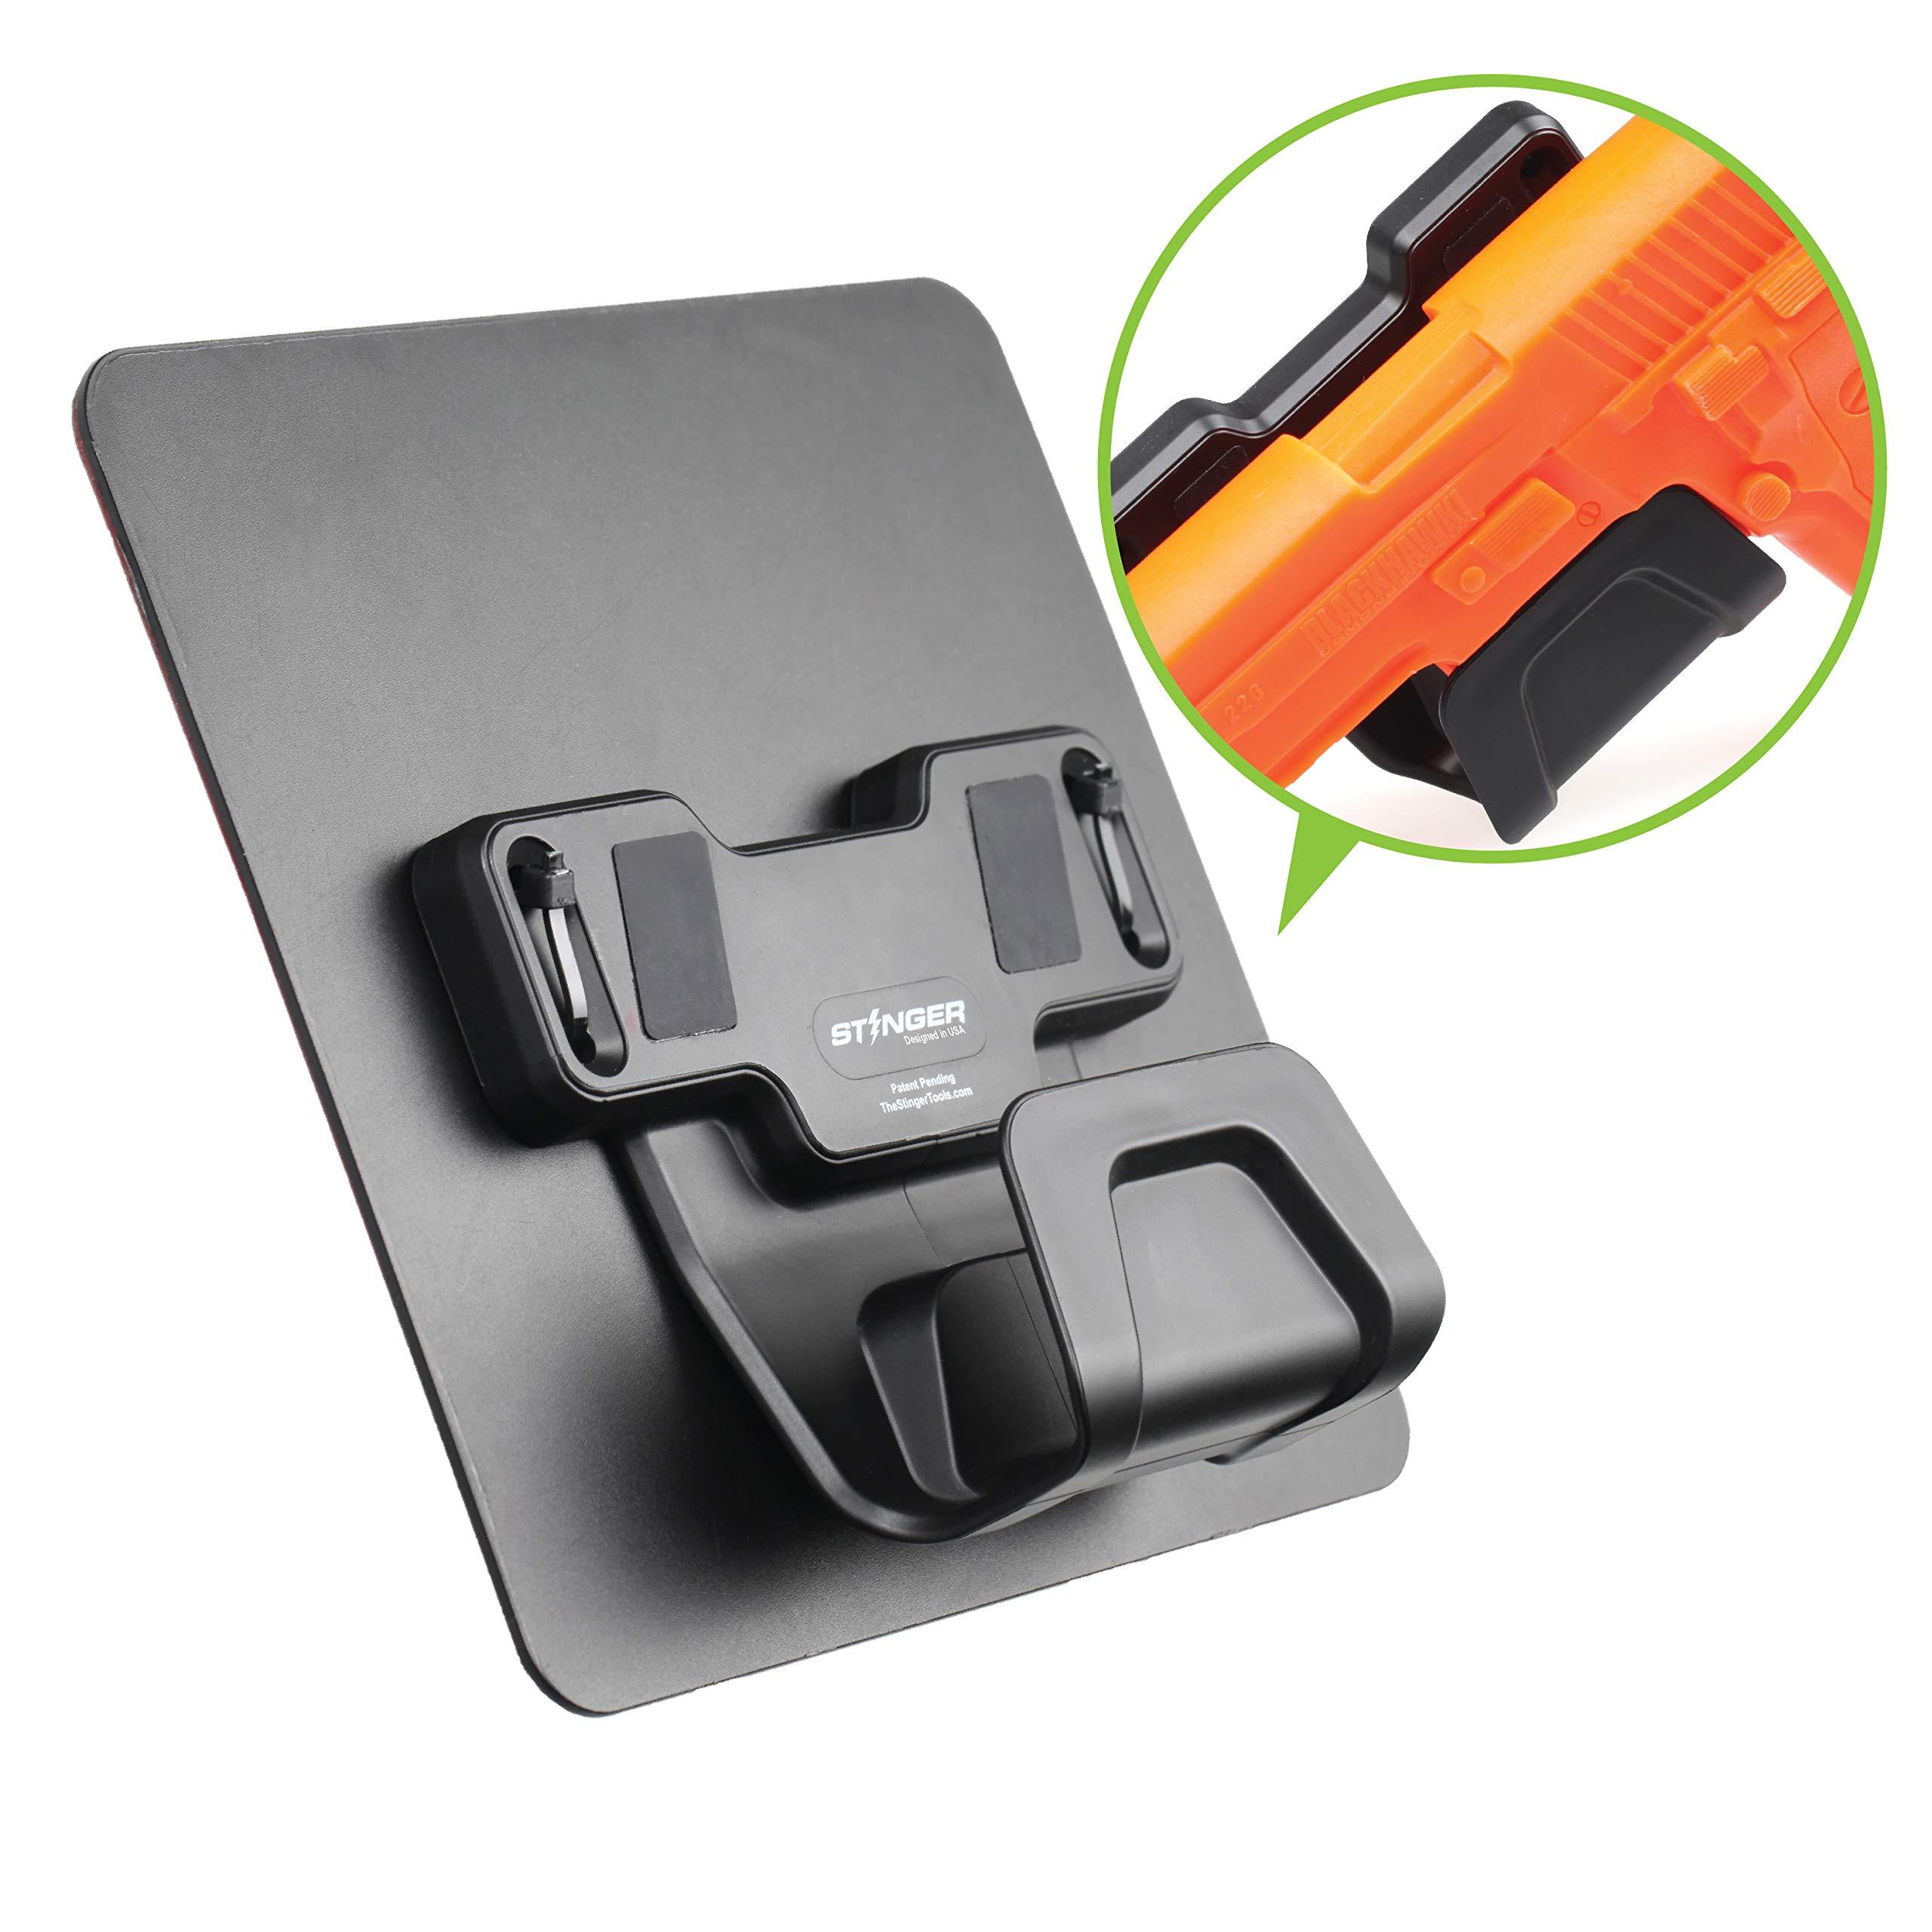 Stinger Magnetic Gun Holder w/Safety Trigger Guard Protection, w/Heavy Duty Adhesive Plate Non-Drill Solution, Wall Mount Gun Rack Holster Handgun Shotgun Firearm Conceal (Black 1 pc)